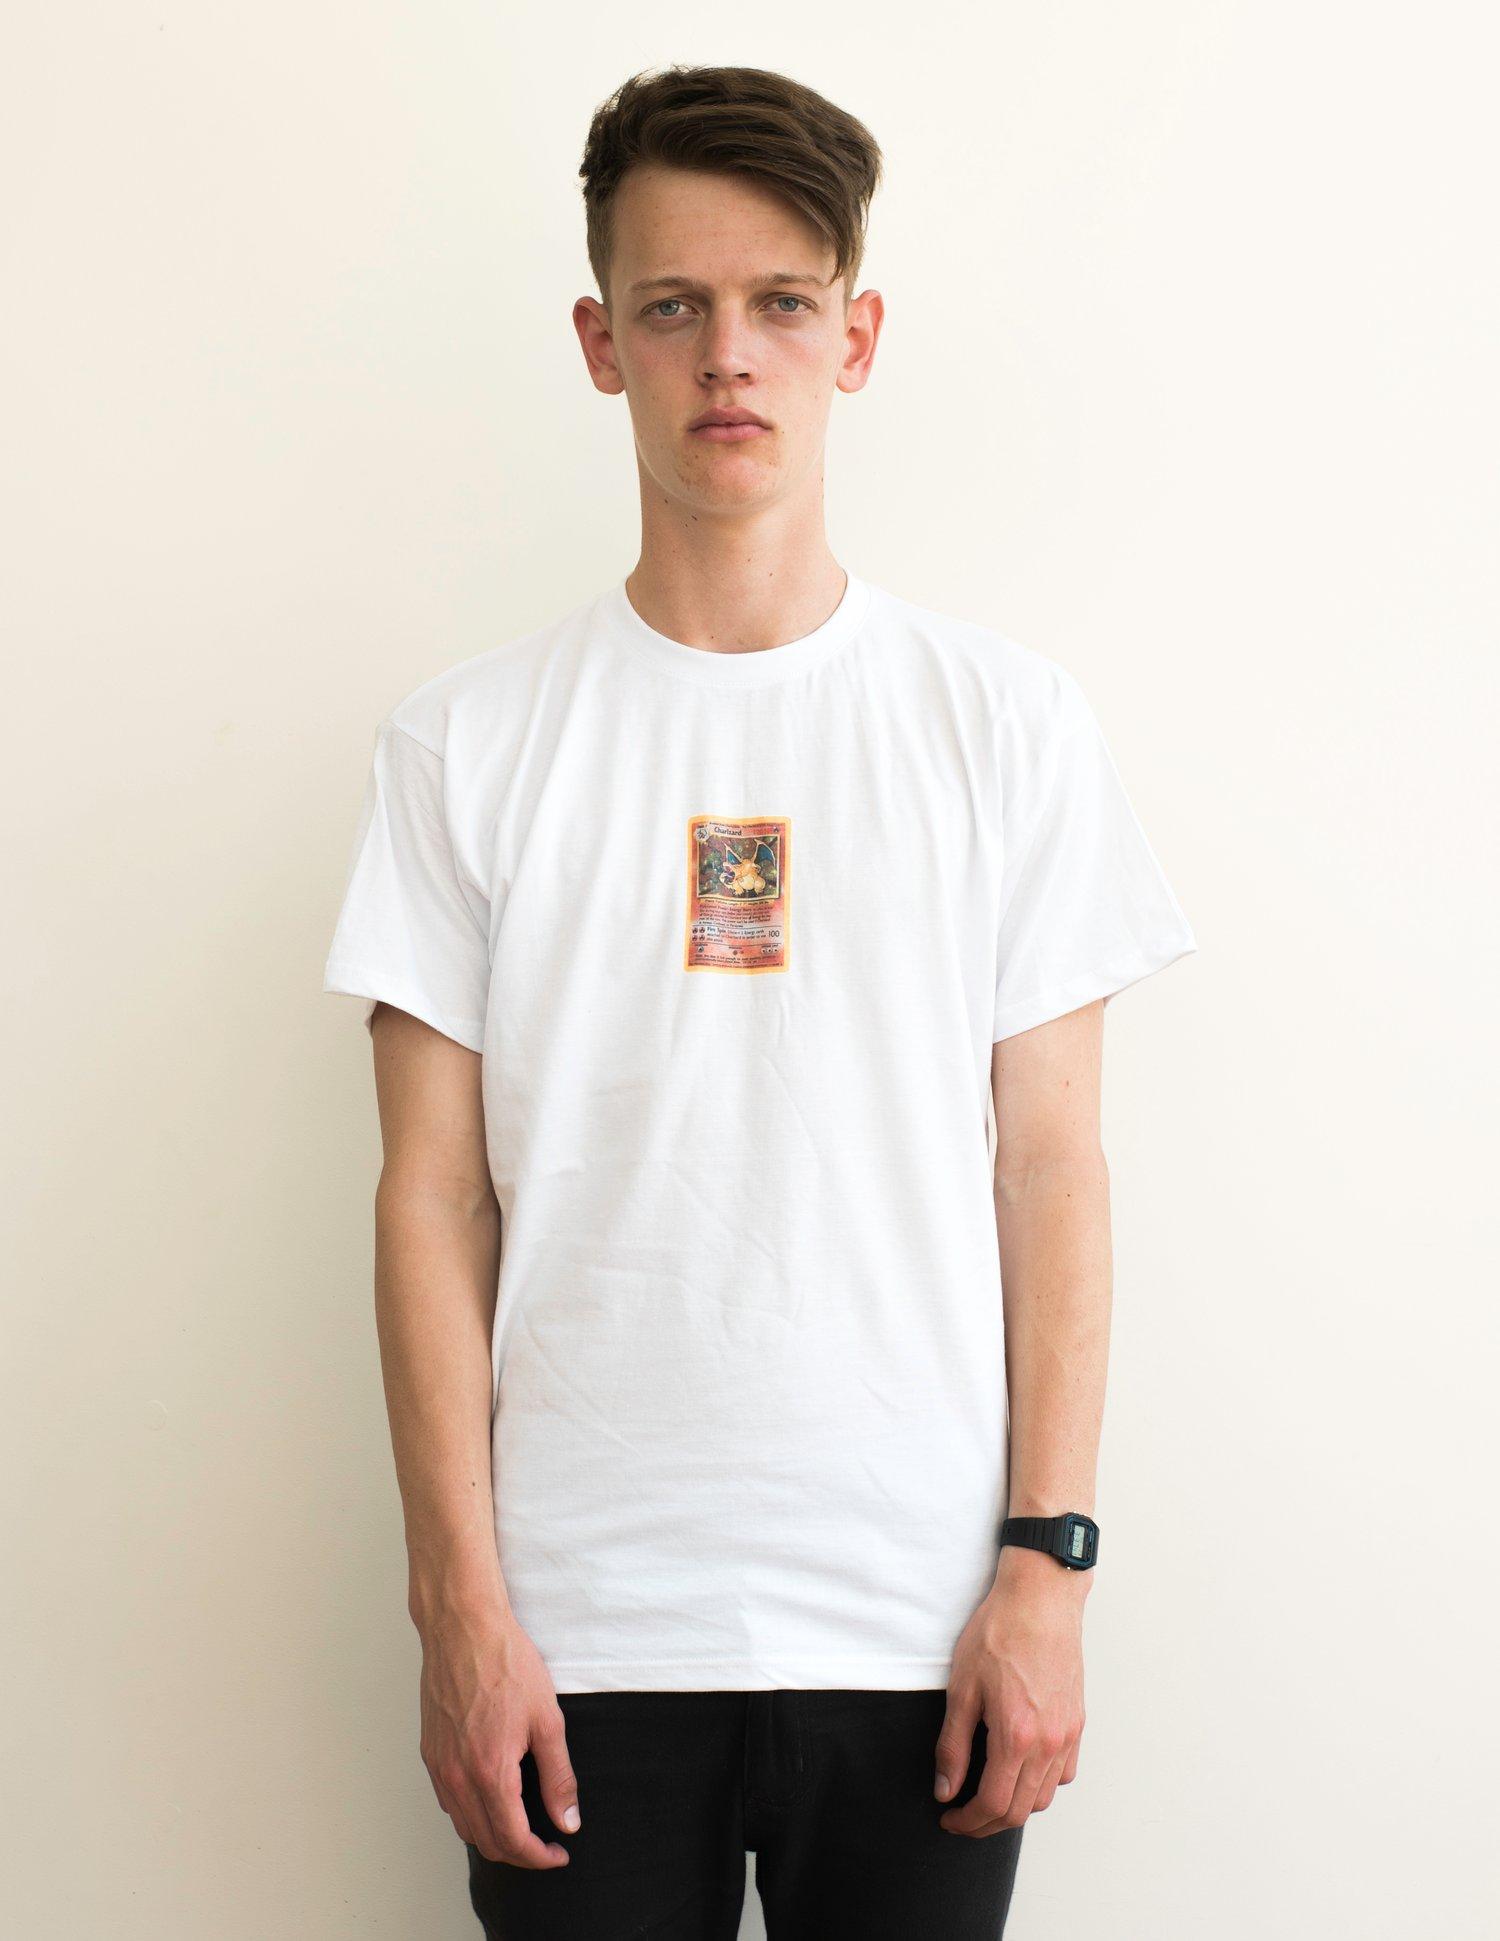 Image of Charizard T-Shirt